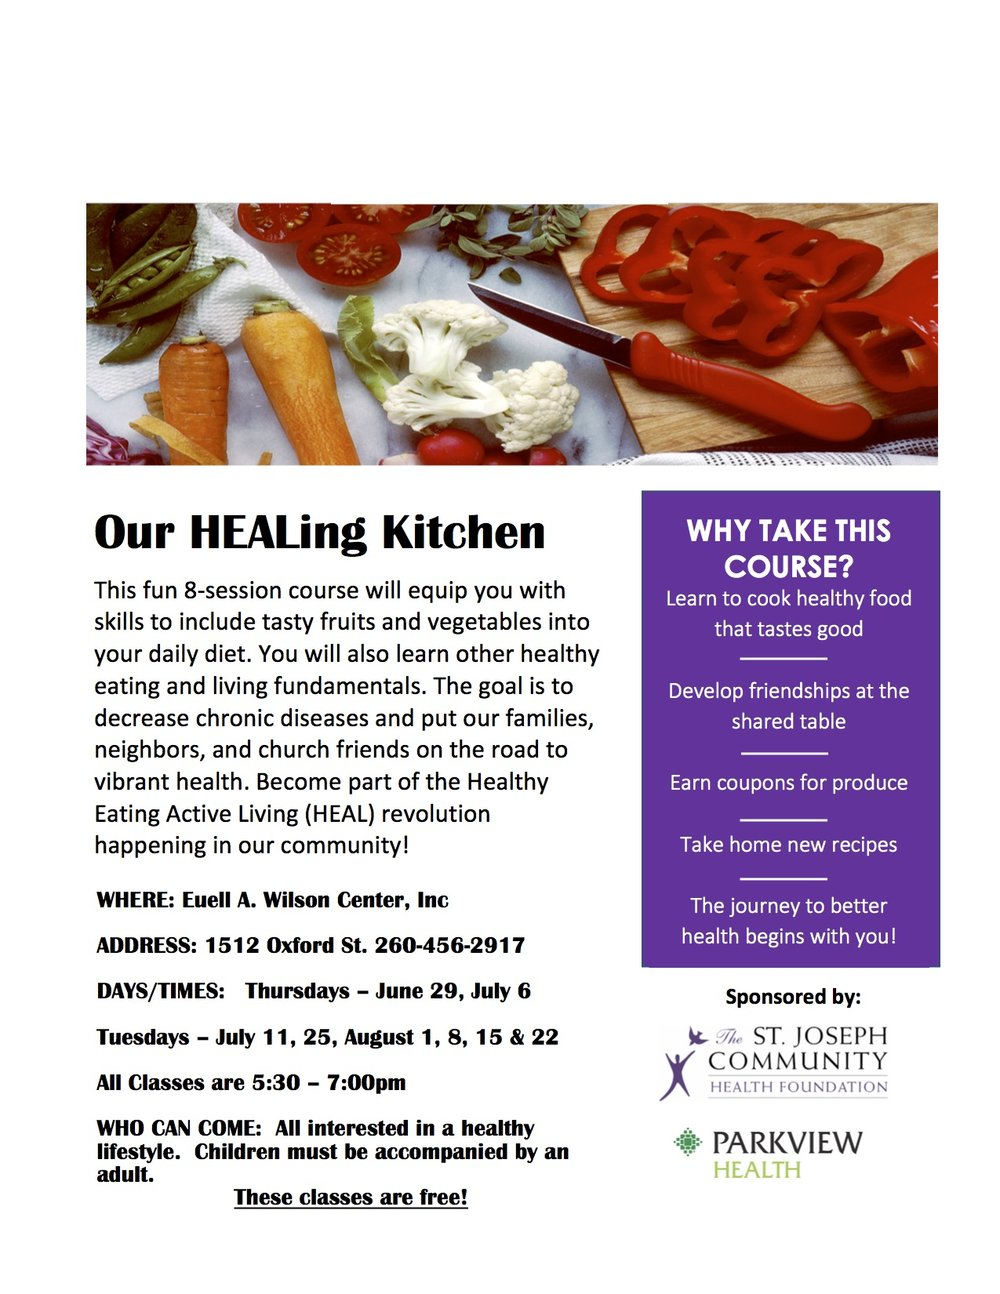 Our Healing Kitchen